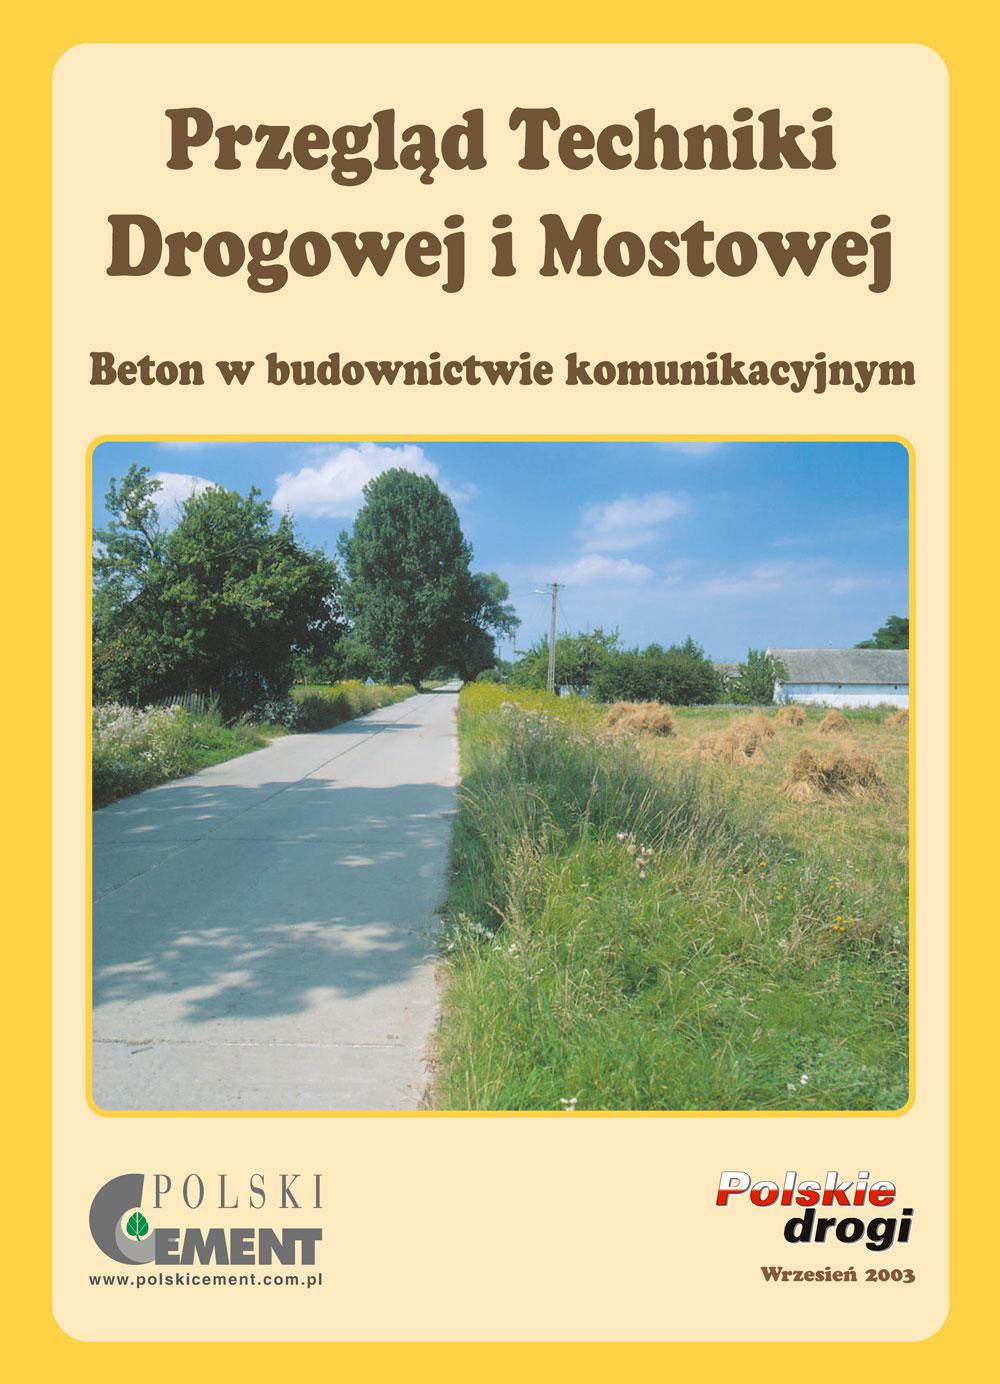 https://www.betonowedrogi.com/wp-content/uploads/2020/07/broszura-polskie-drogi-cala_Strona_01.jpg